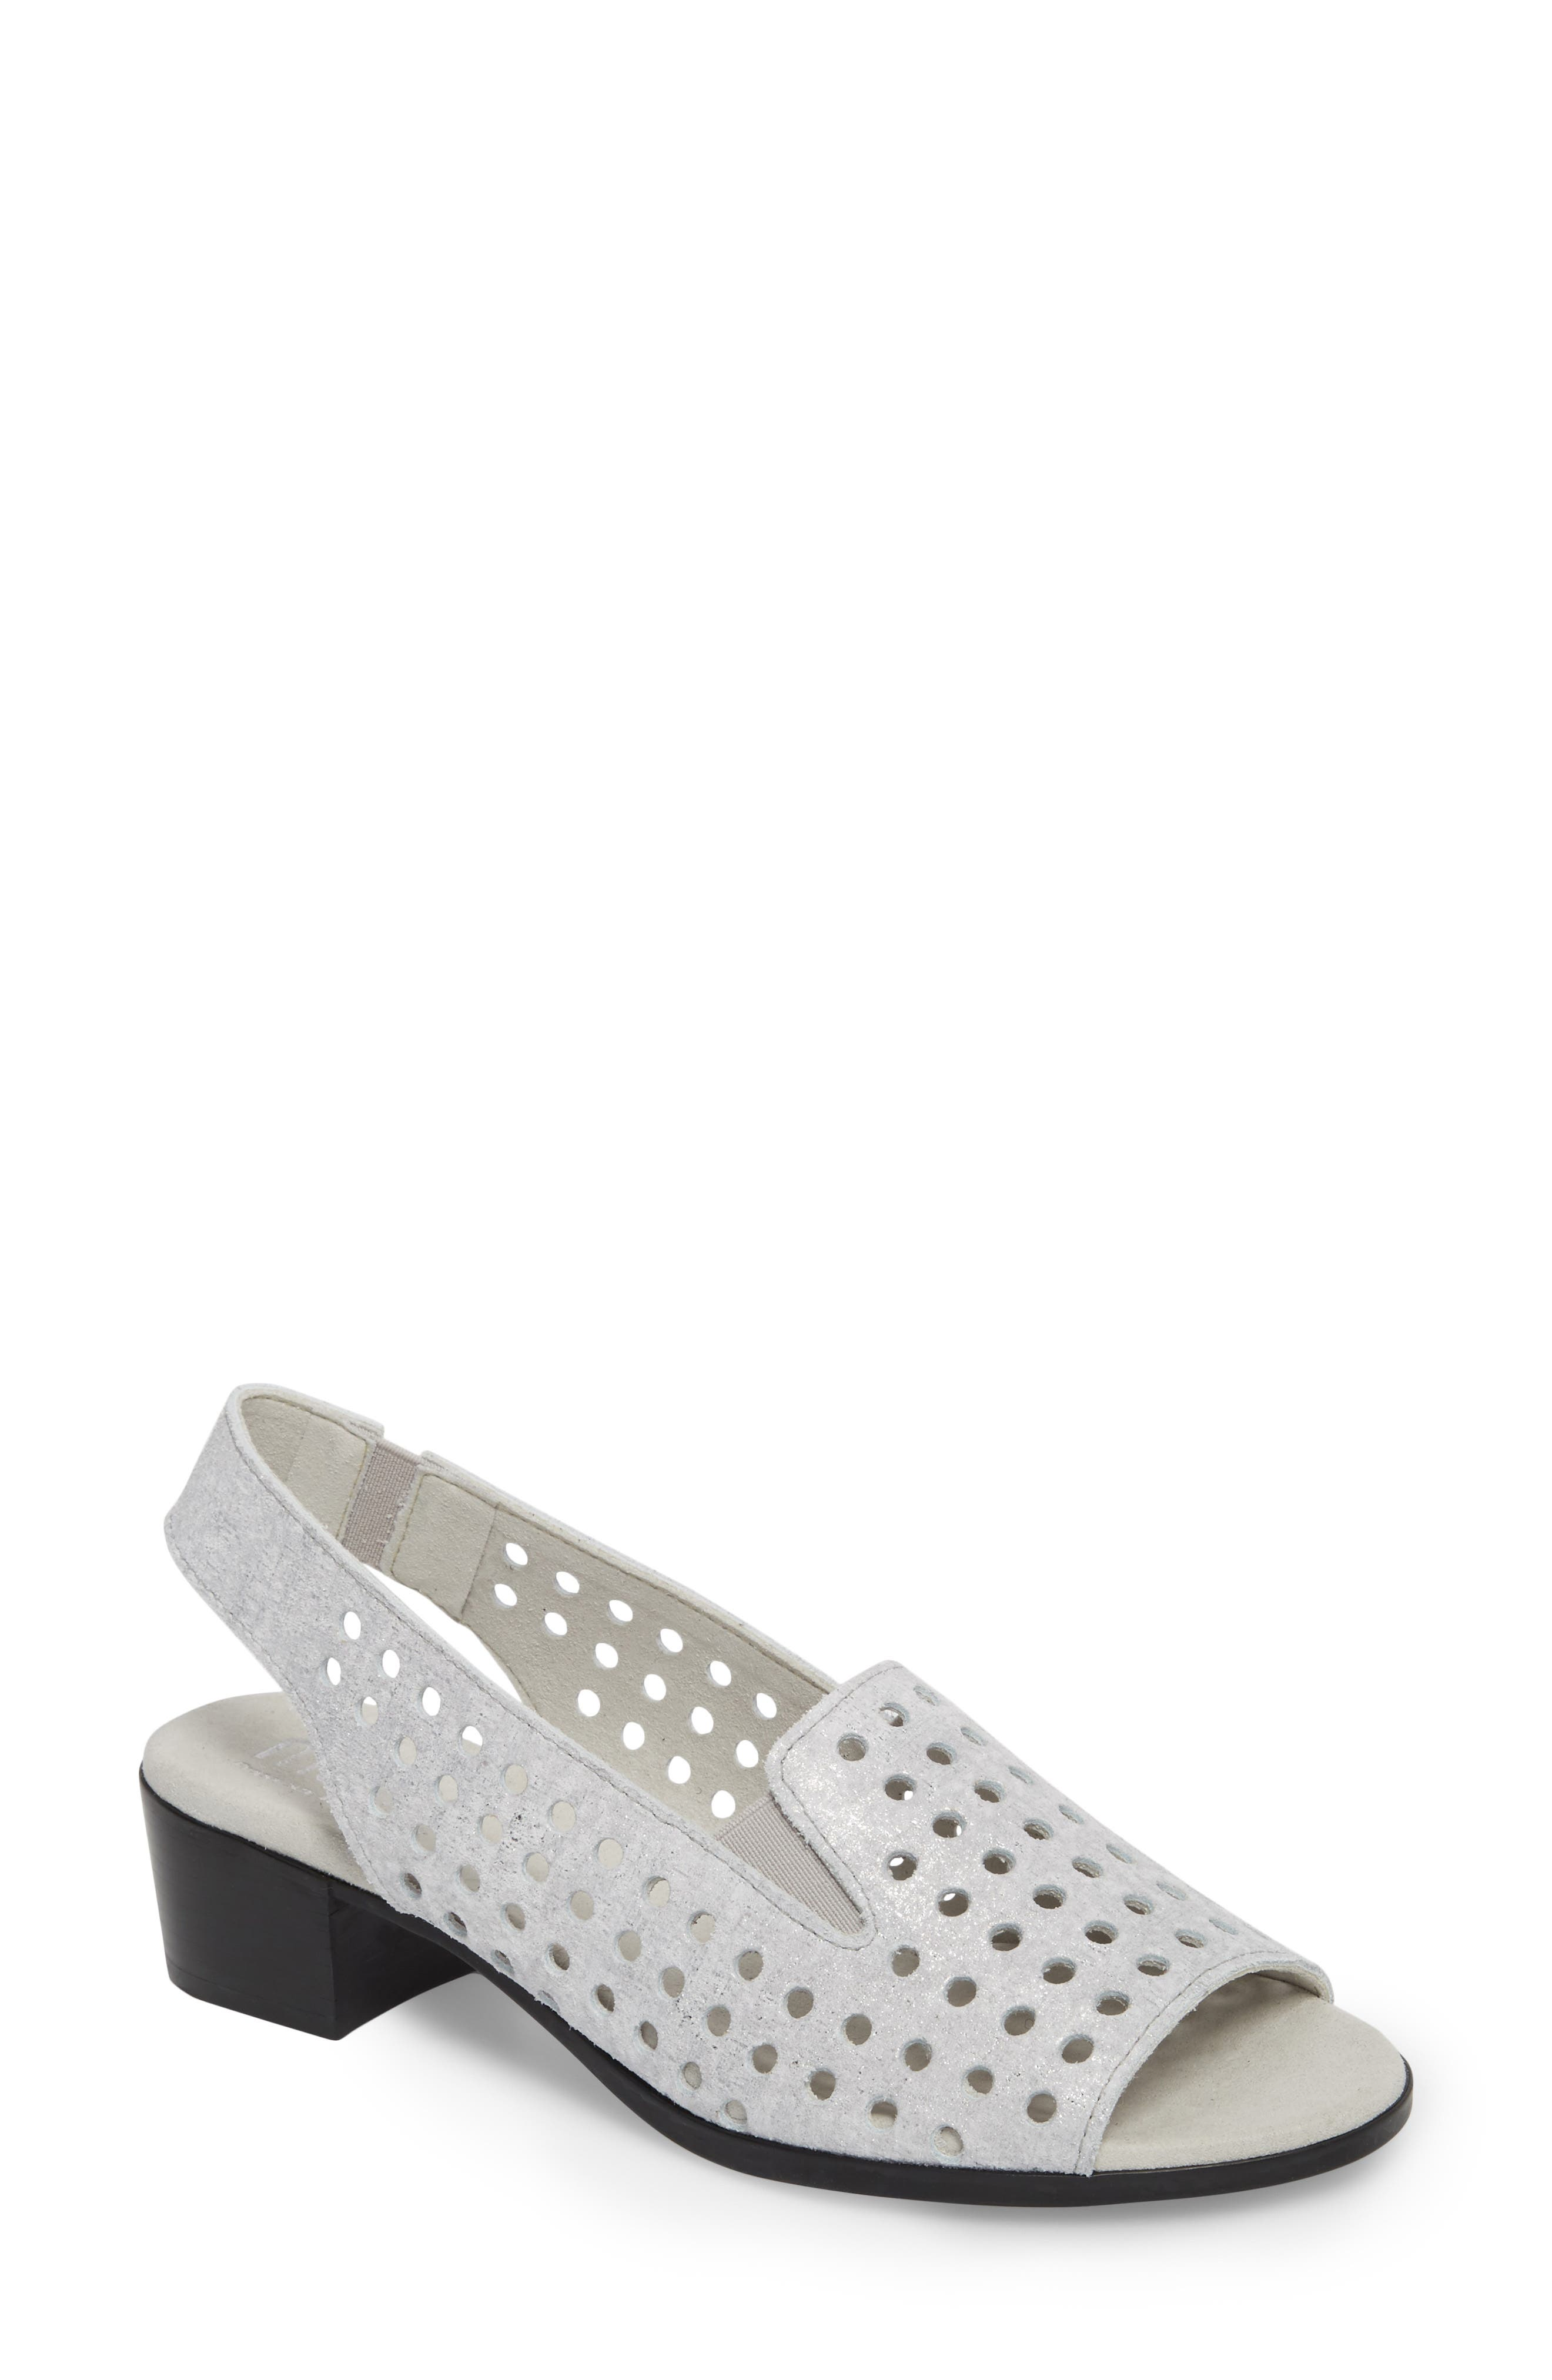 Mickee Slingback Sandal,                         Main,                         color, Silver Metallic Suede